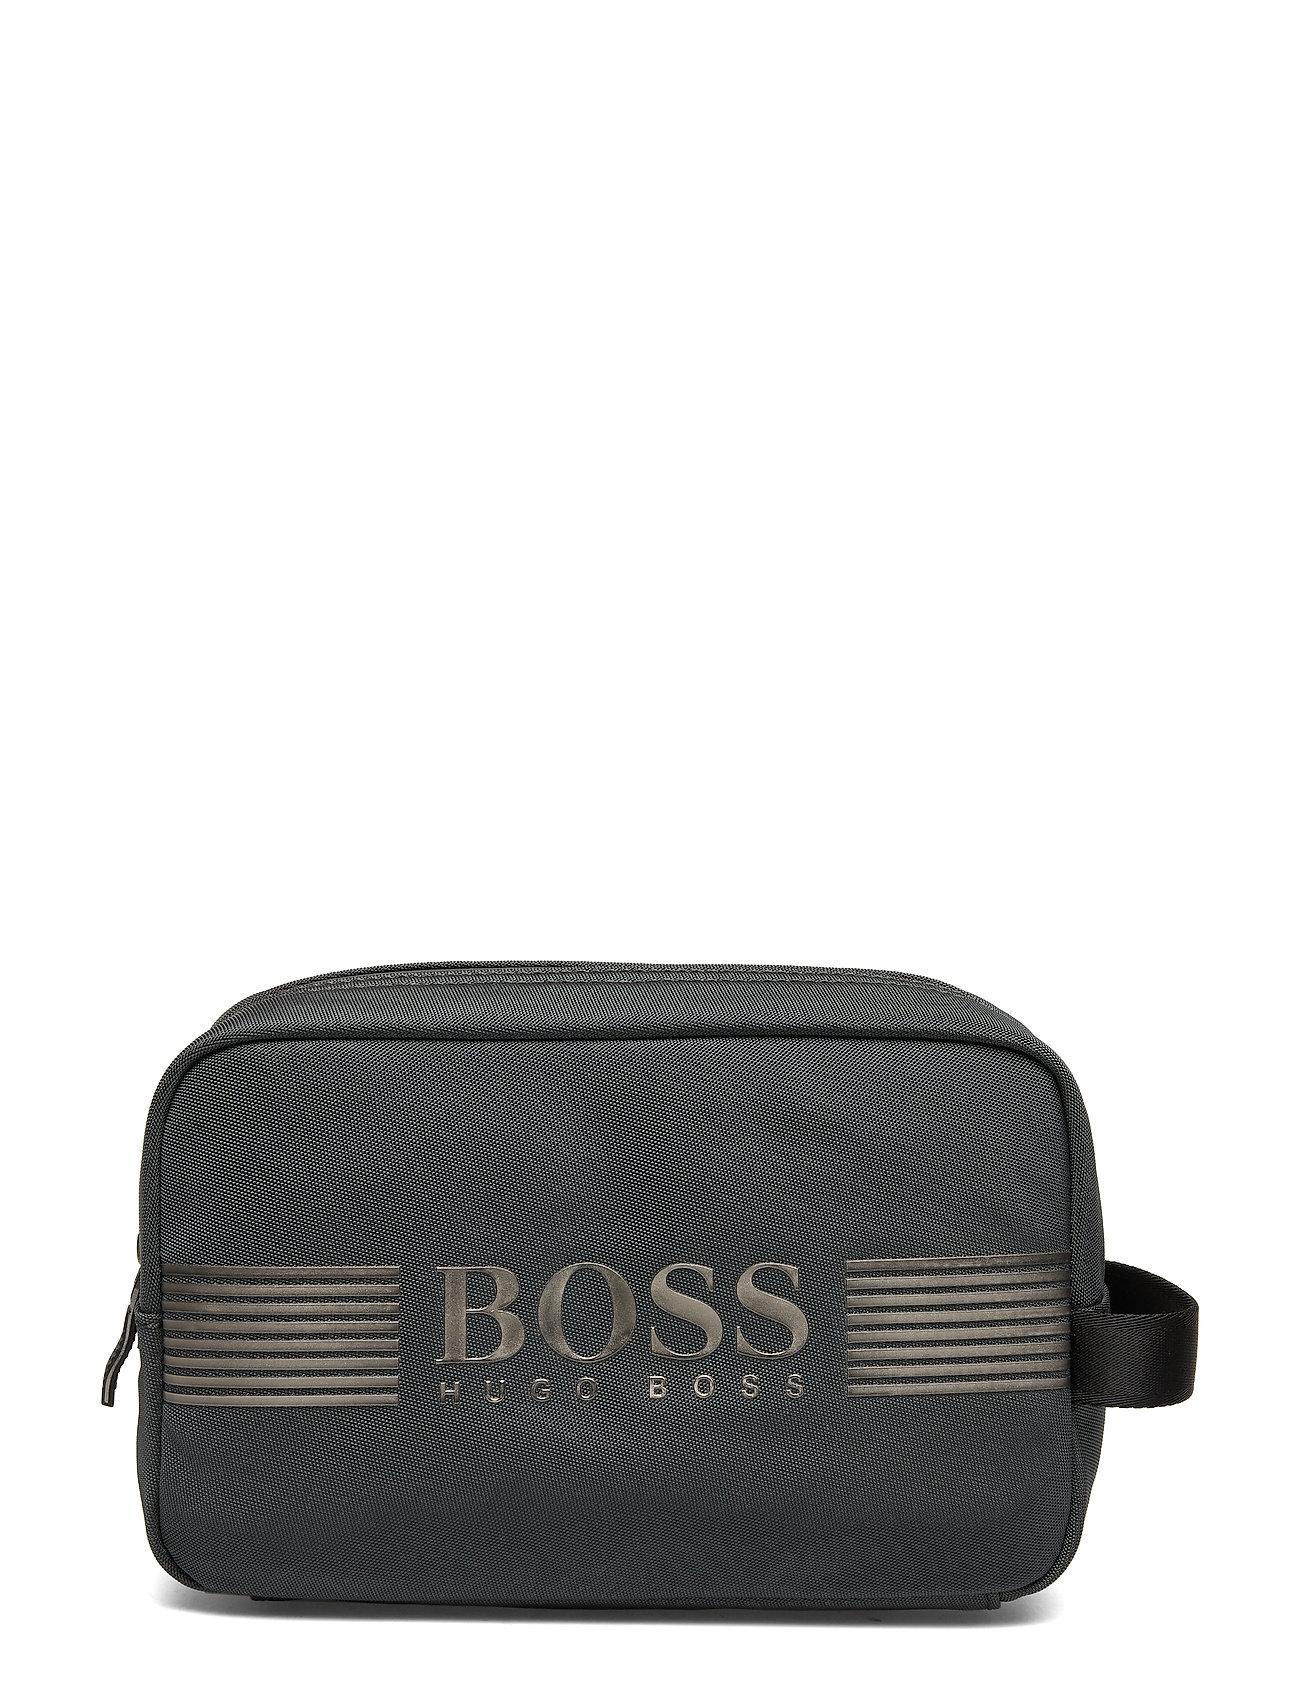 BOSS Business Wear Pixel ML_Washbag - DARK GREY